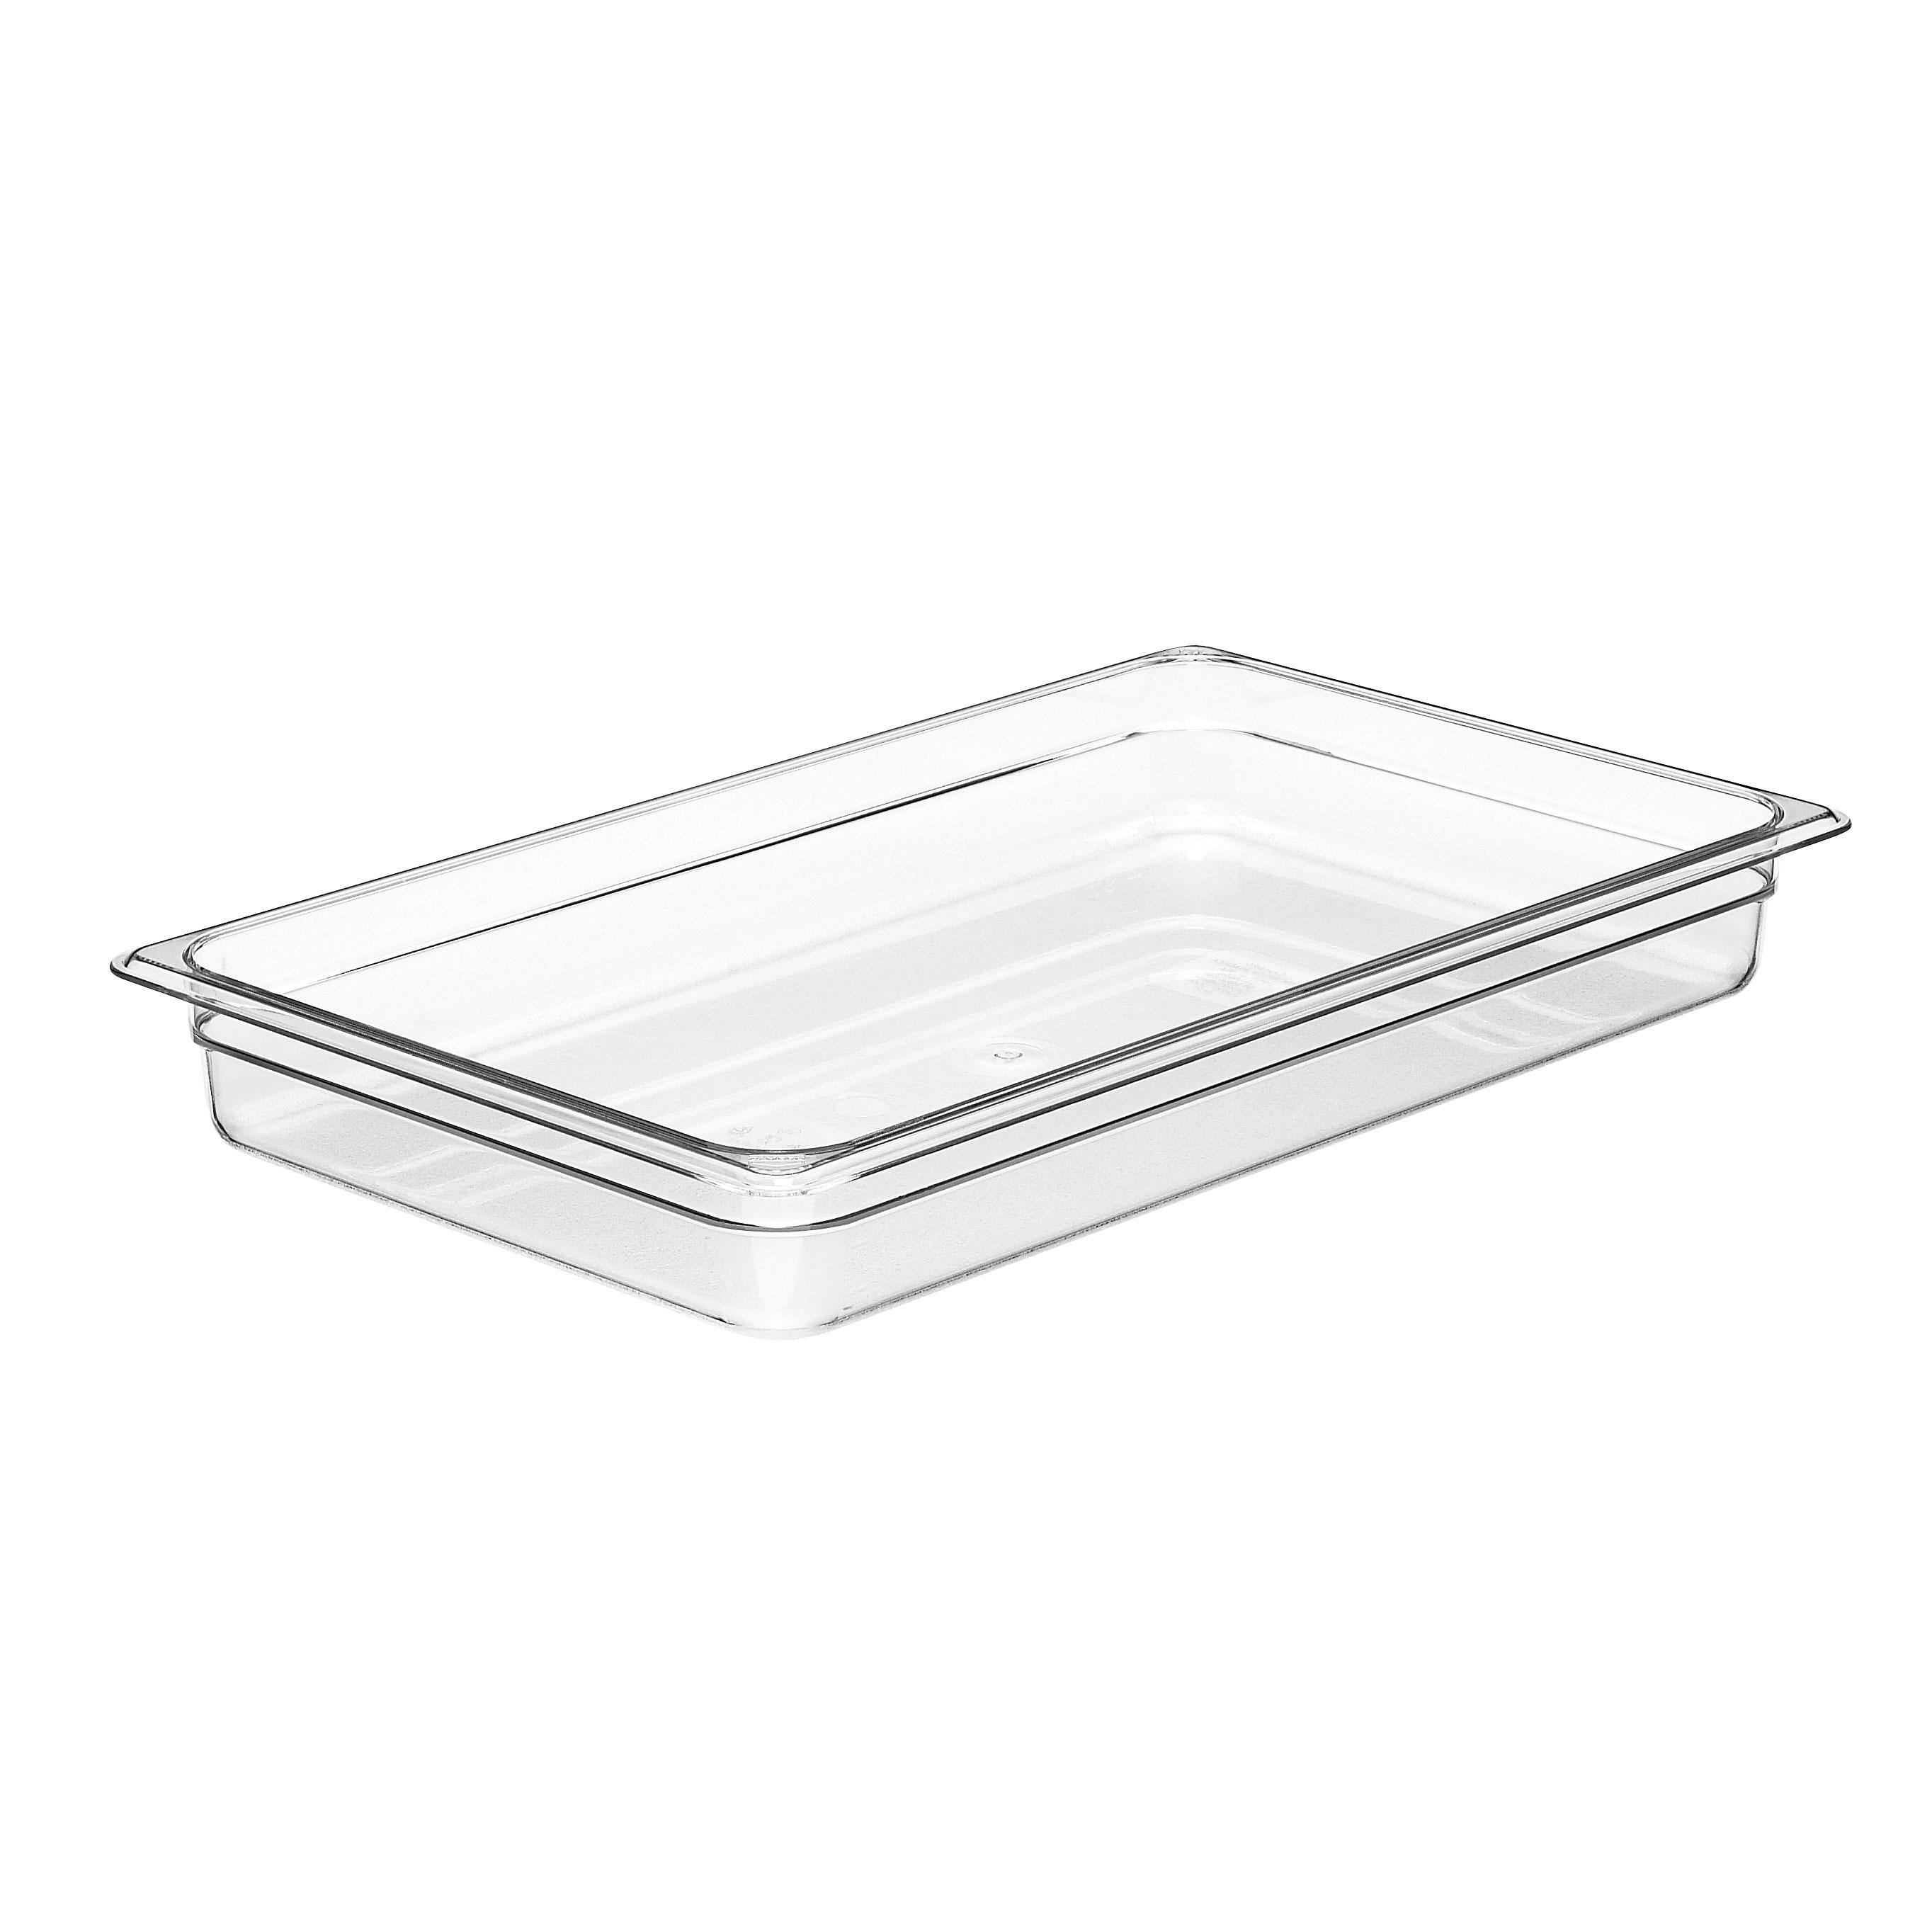 Cambro 12CW135 food/beverage storage container